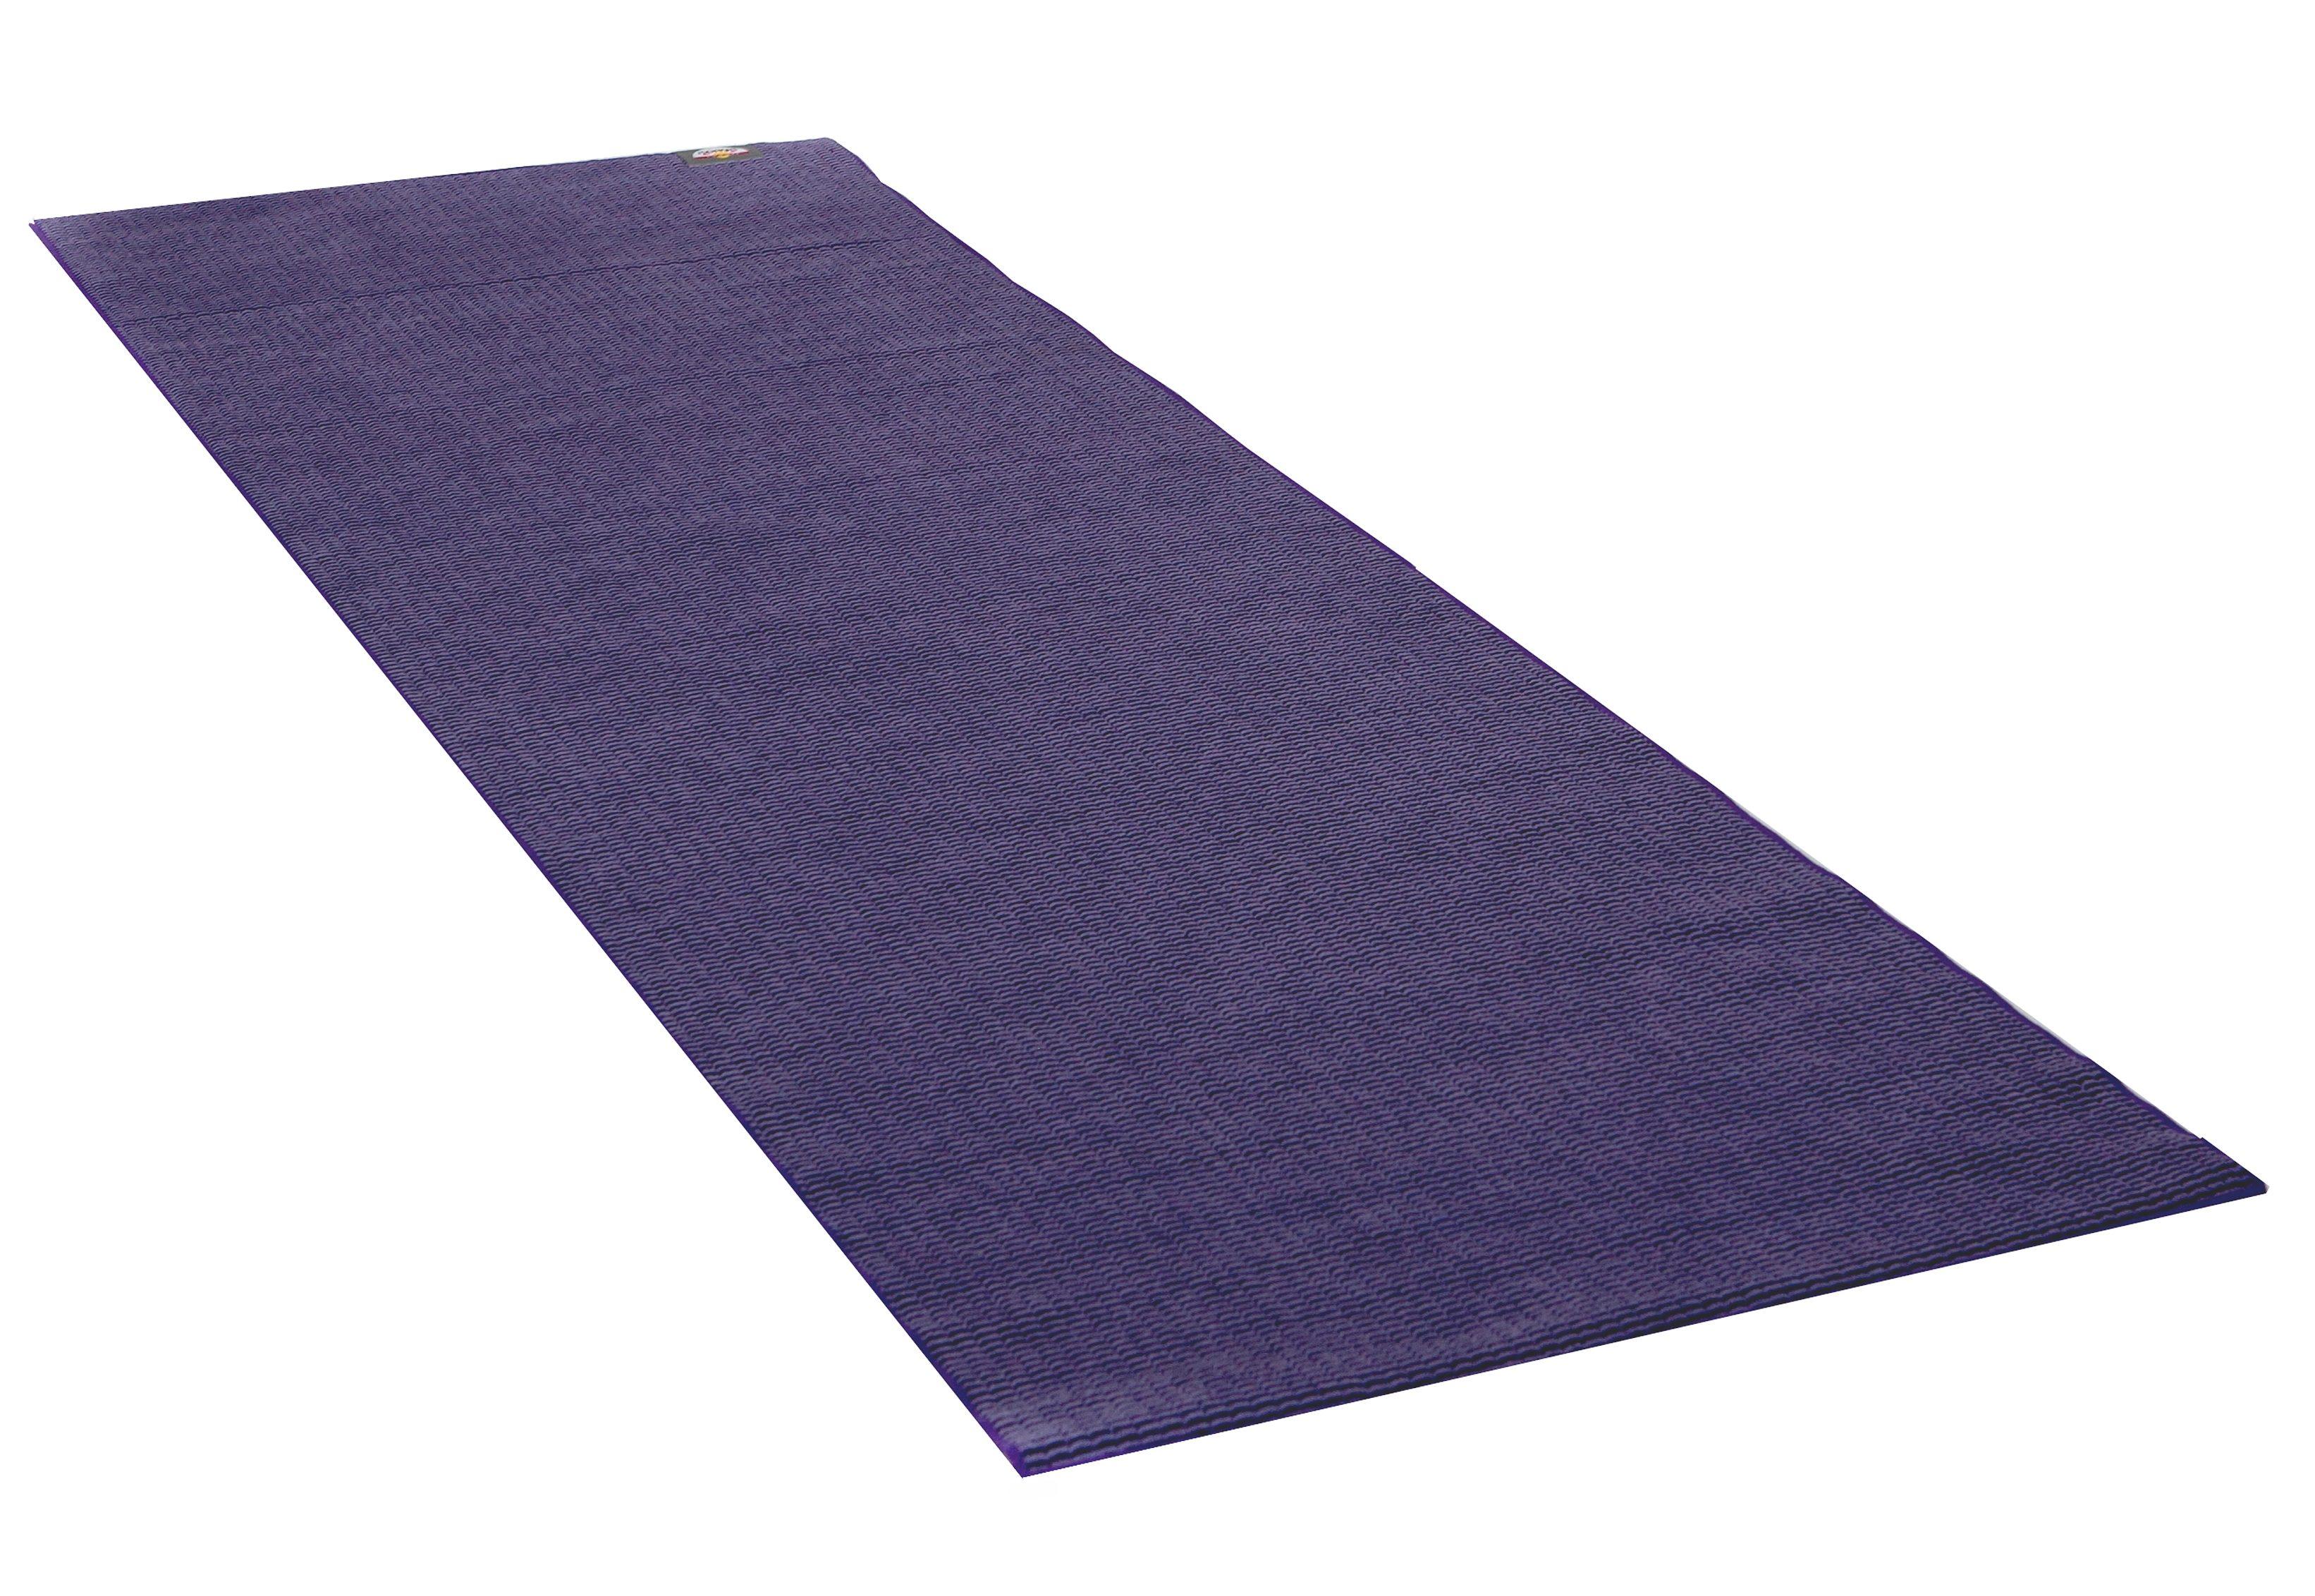 Finnlo by Hammer Yogamatte, »Alaya Loma violett«